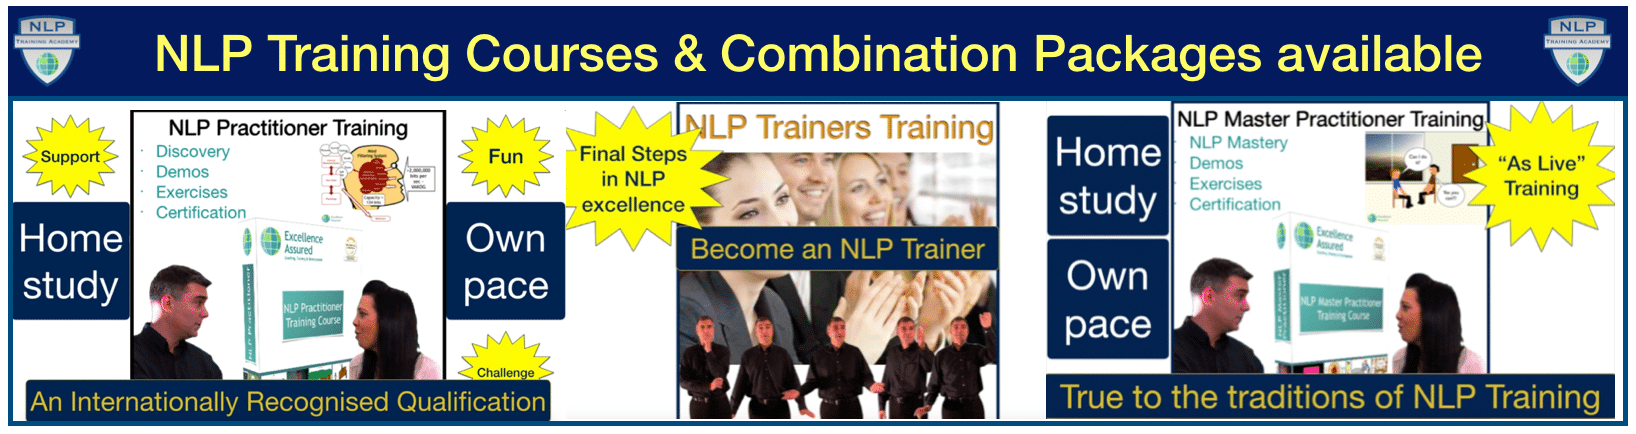 NLP Training Online - online NLP courses